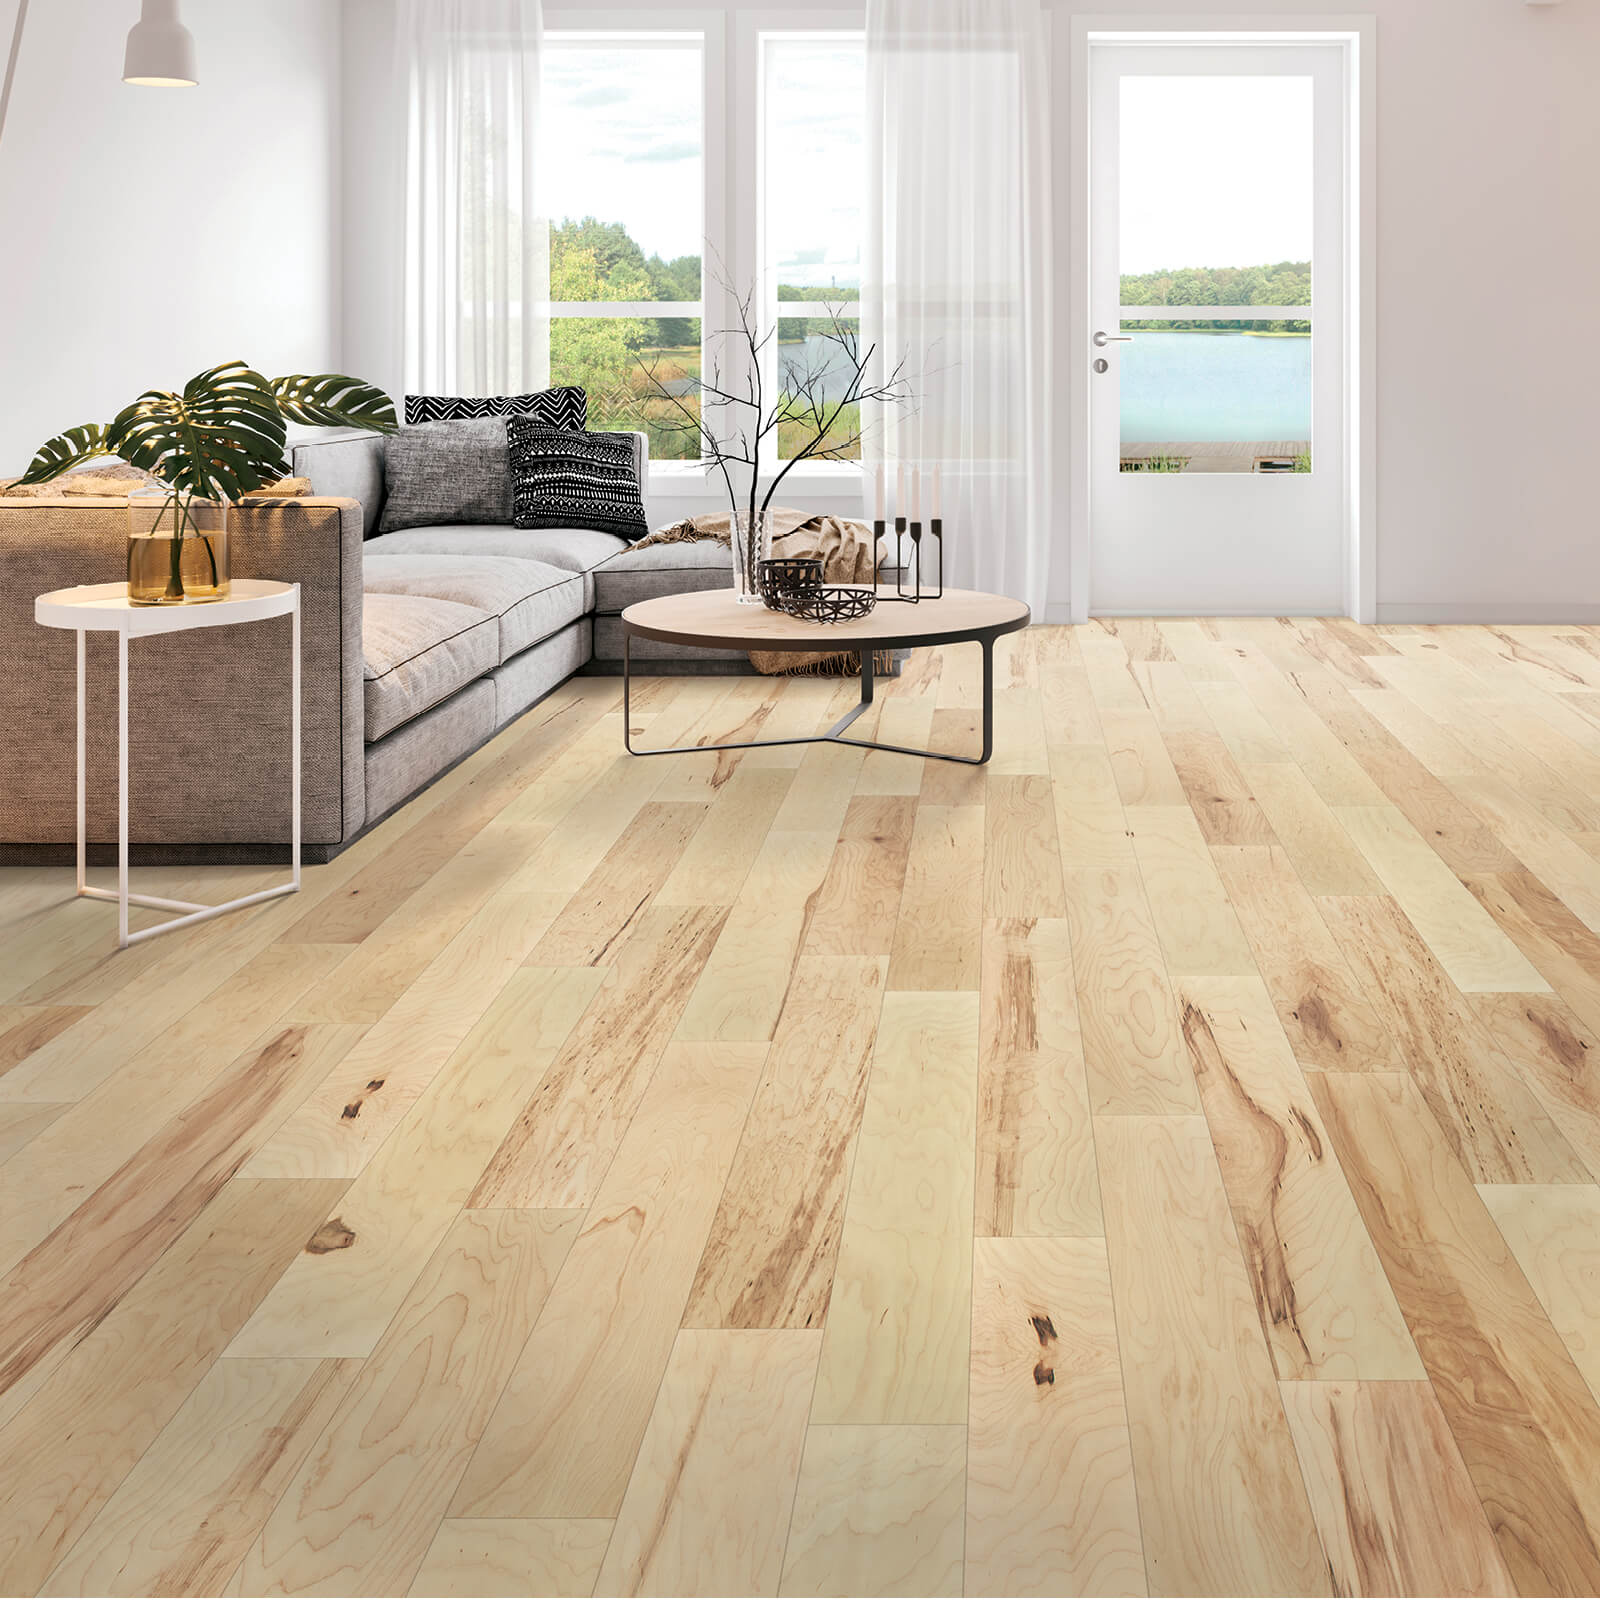 Highlands ranch flooring | Great Floors